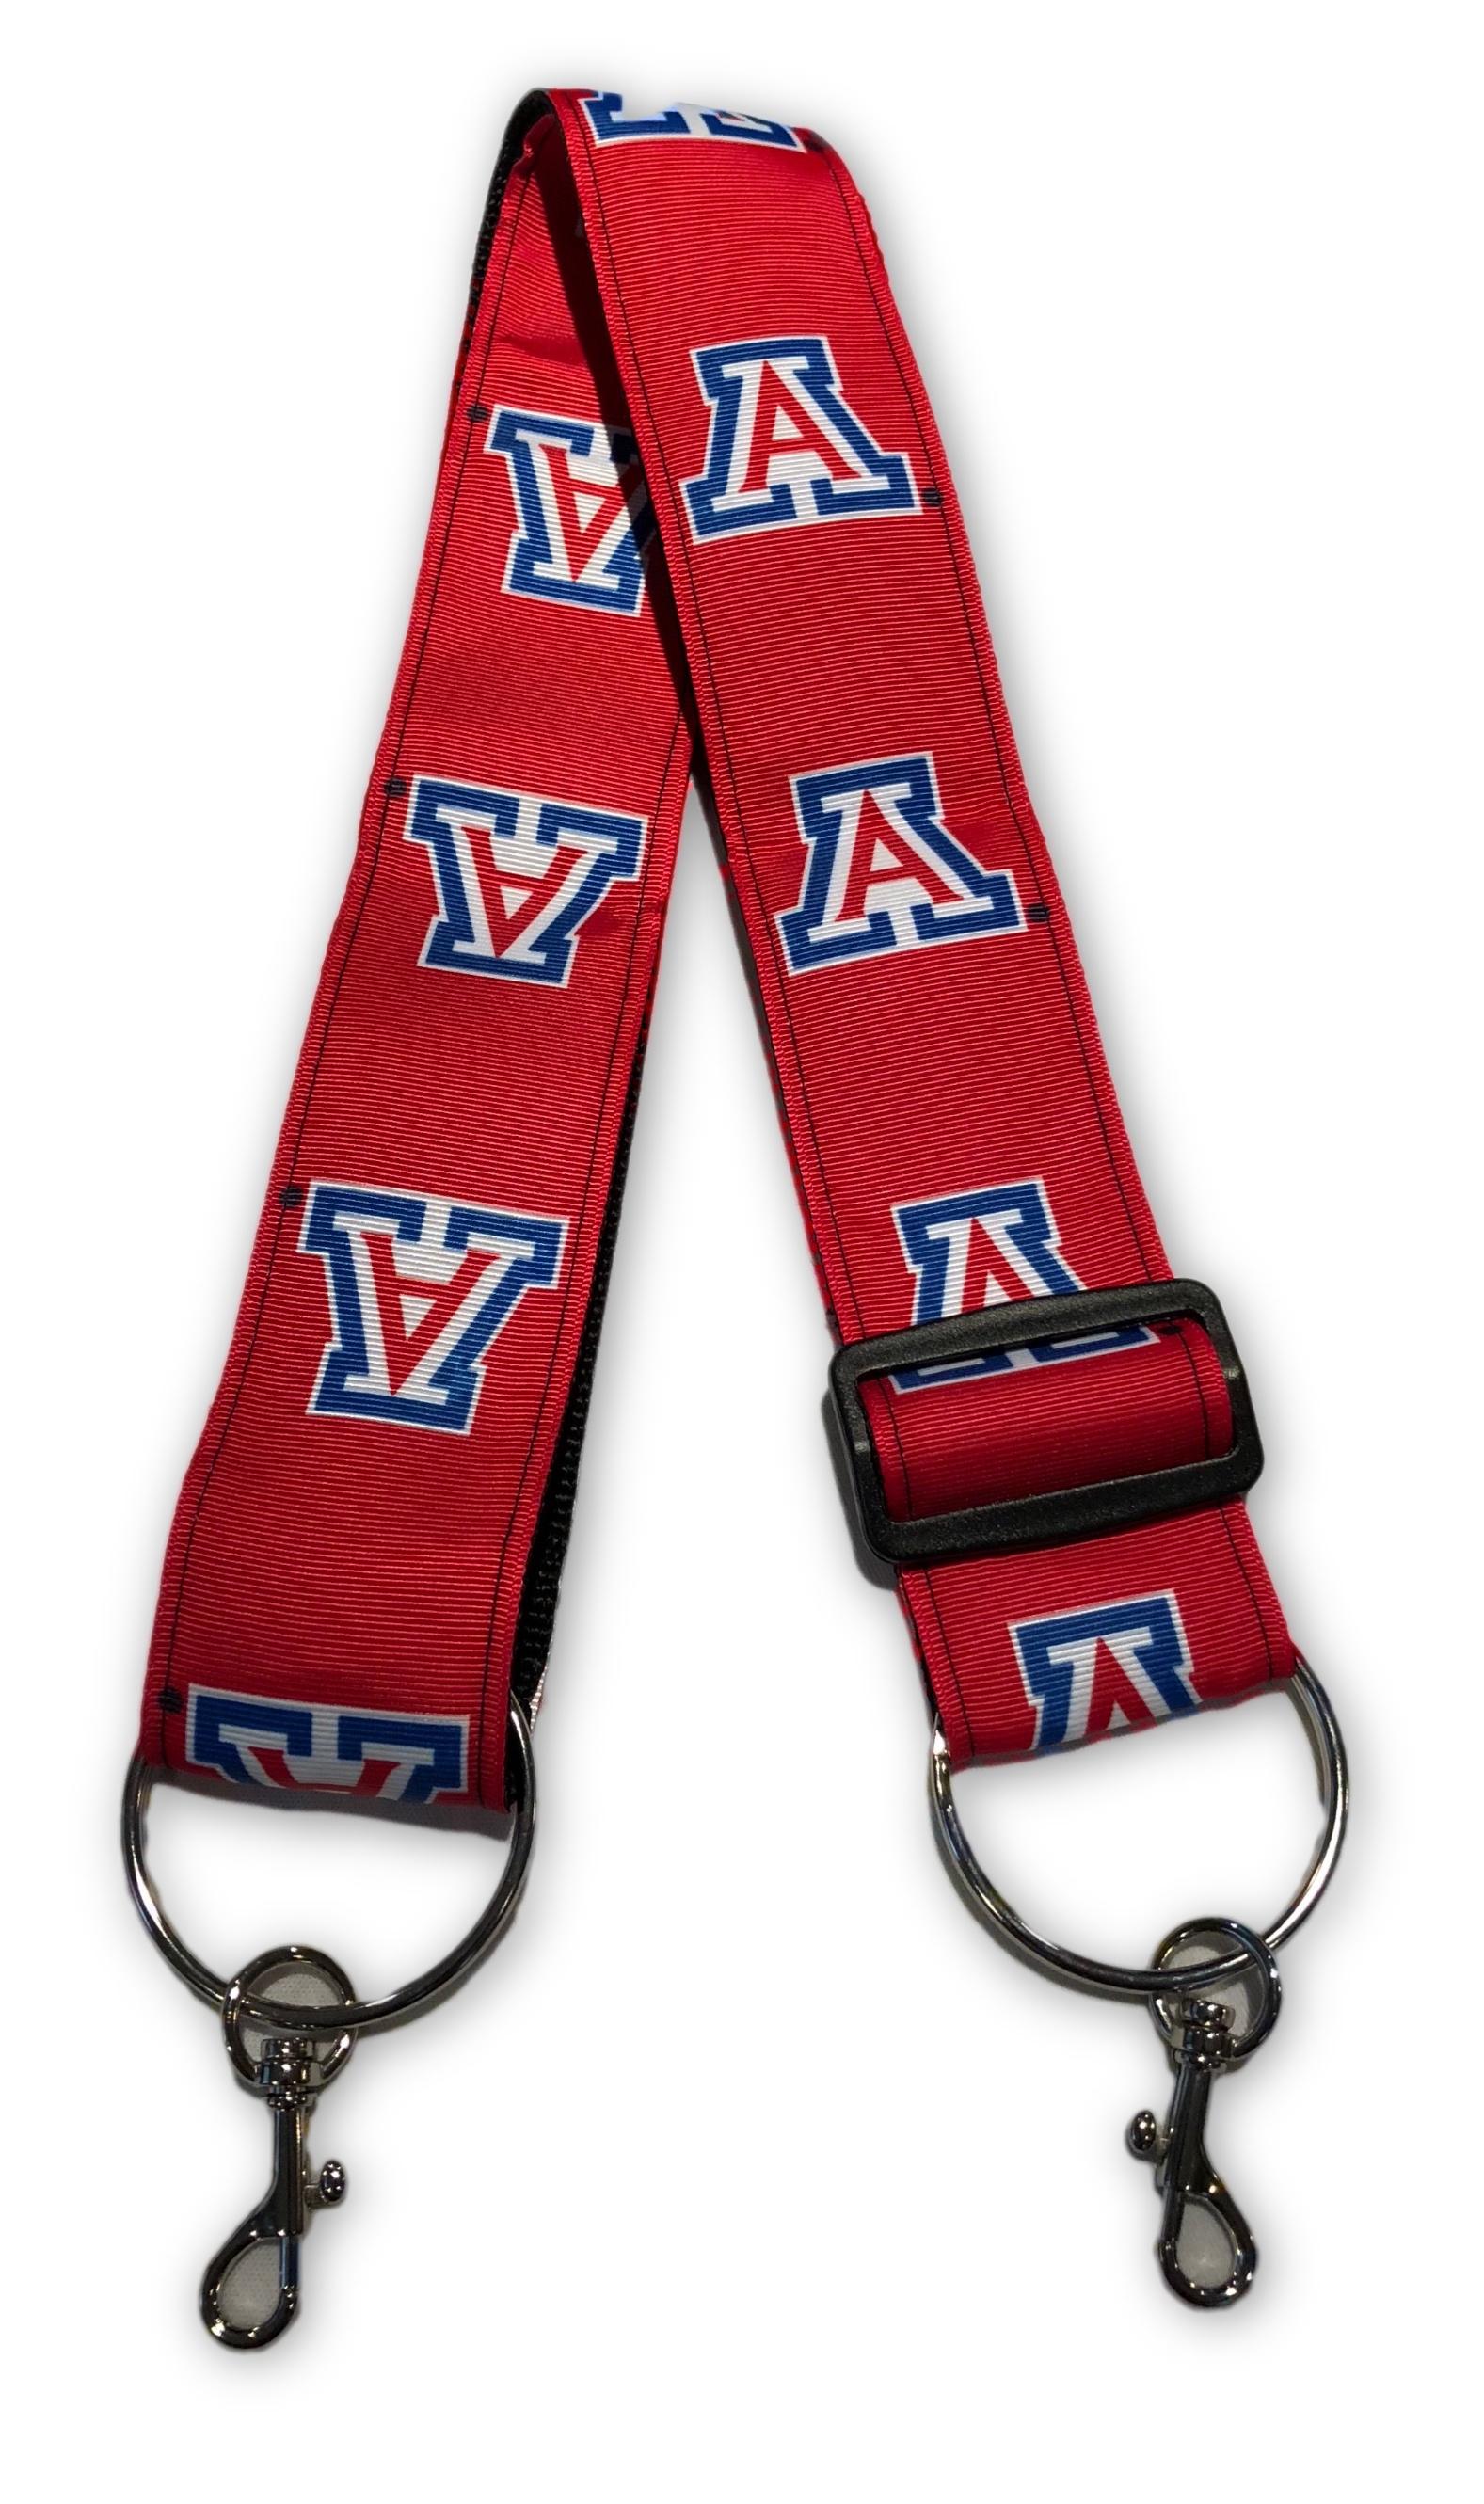 Berkeley Cal NCAA Collegiate Shoulder Bag Strap